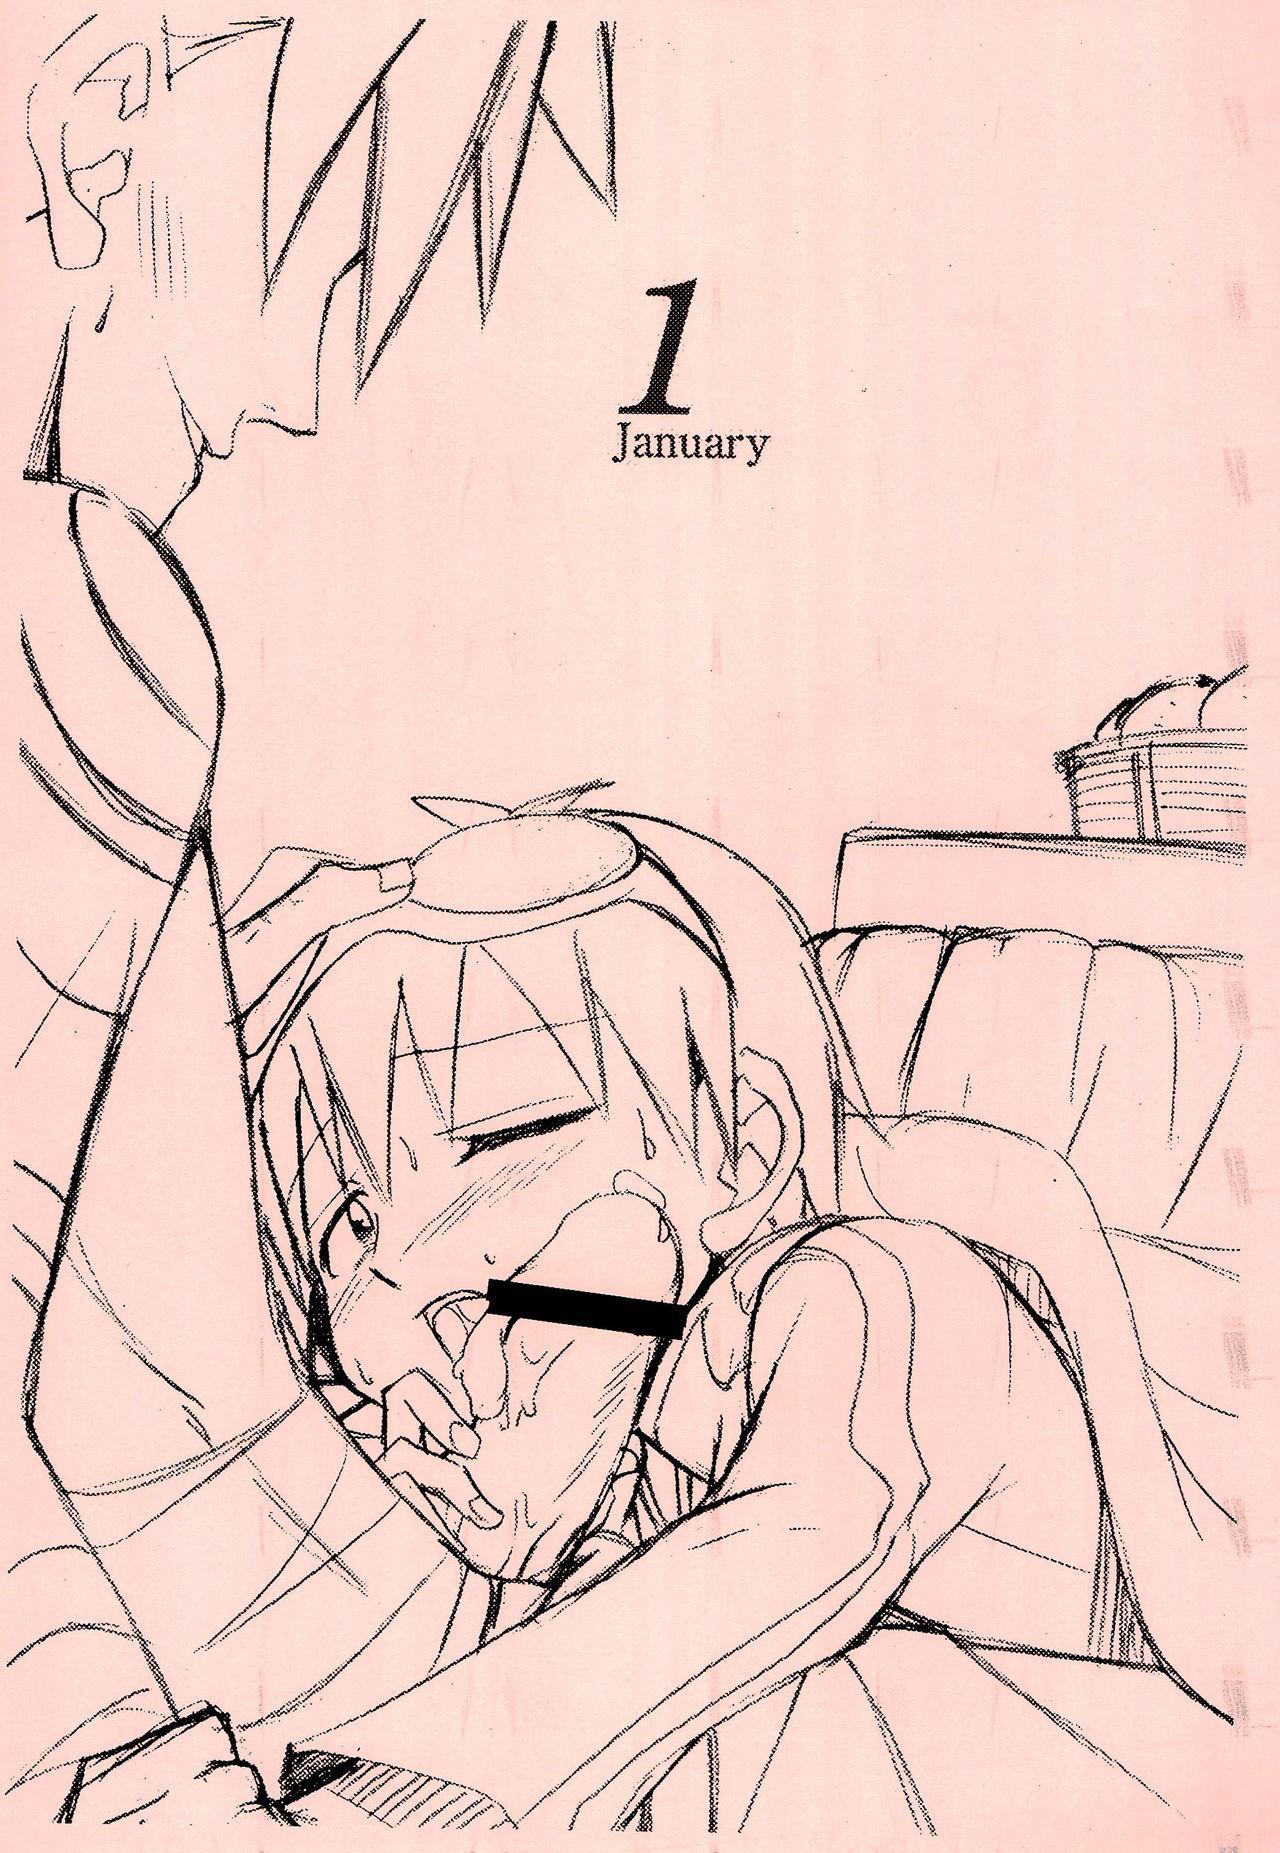 (C72) [Shamon Tei (Shamon)] KamiShimo to Ichinenjuu 2007-nen 9-gatsu - 2008-nen 8-gatsu Calendar (Gurren Lagann) 5